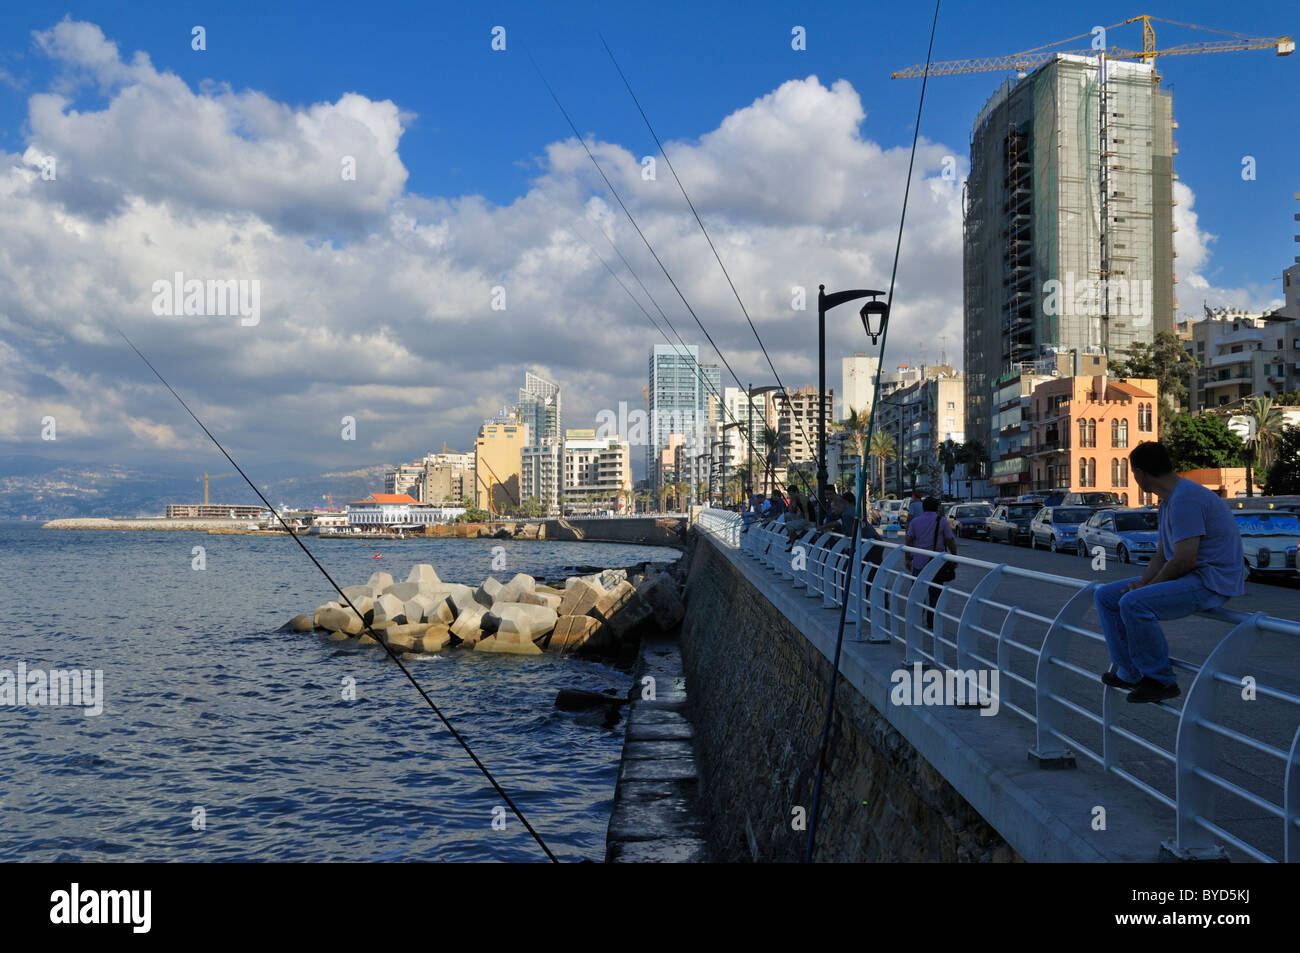 Corniche de Beyrouth, Beyrouth, Liban, Moyen-Orient, Asie de l'Ouest Photo Stock